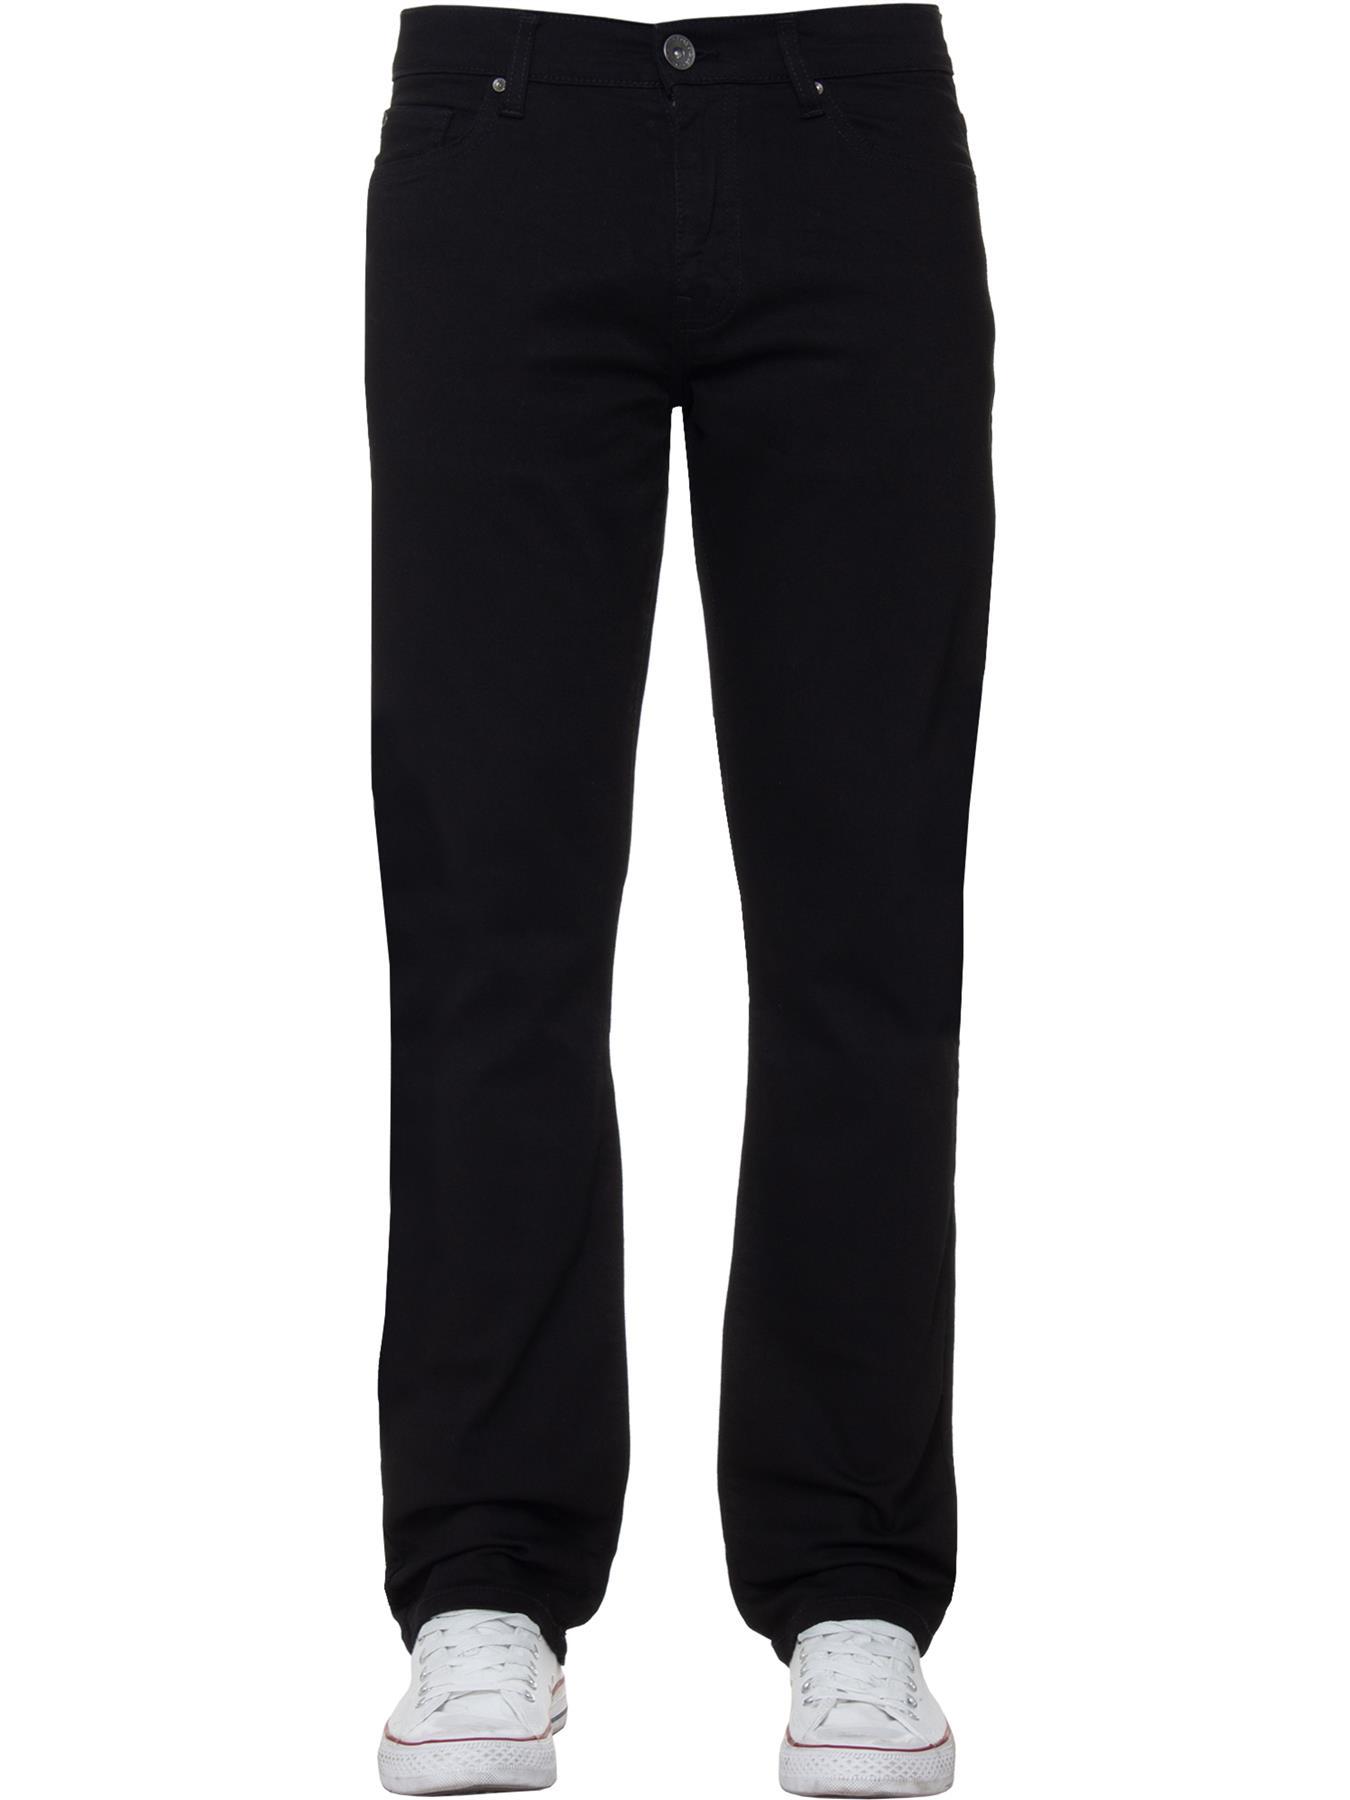 Para-Hombre-Pierna-Recta-Bootcut-Stretch-Denim-Regulares-Pantalon-de-trabajo-Kruze-Todas-Cinturas miniatura 24